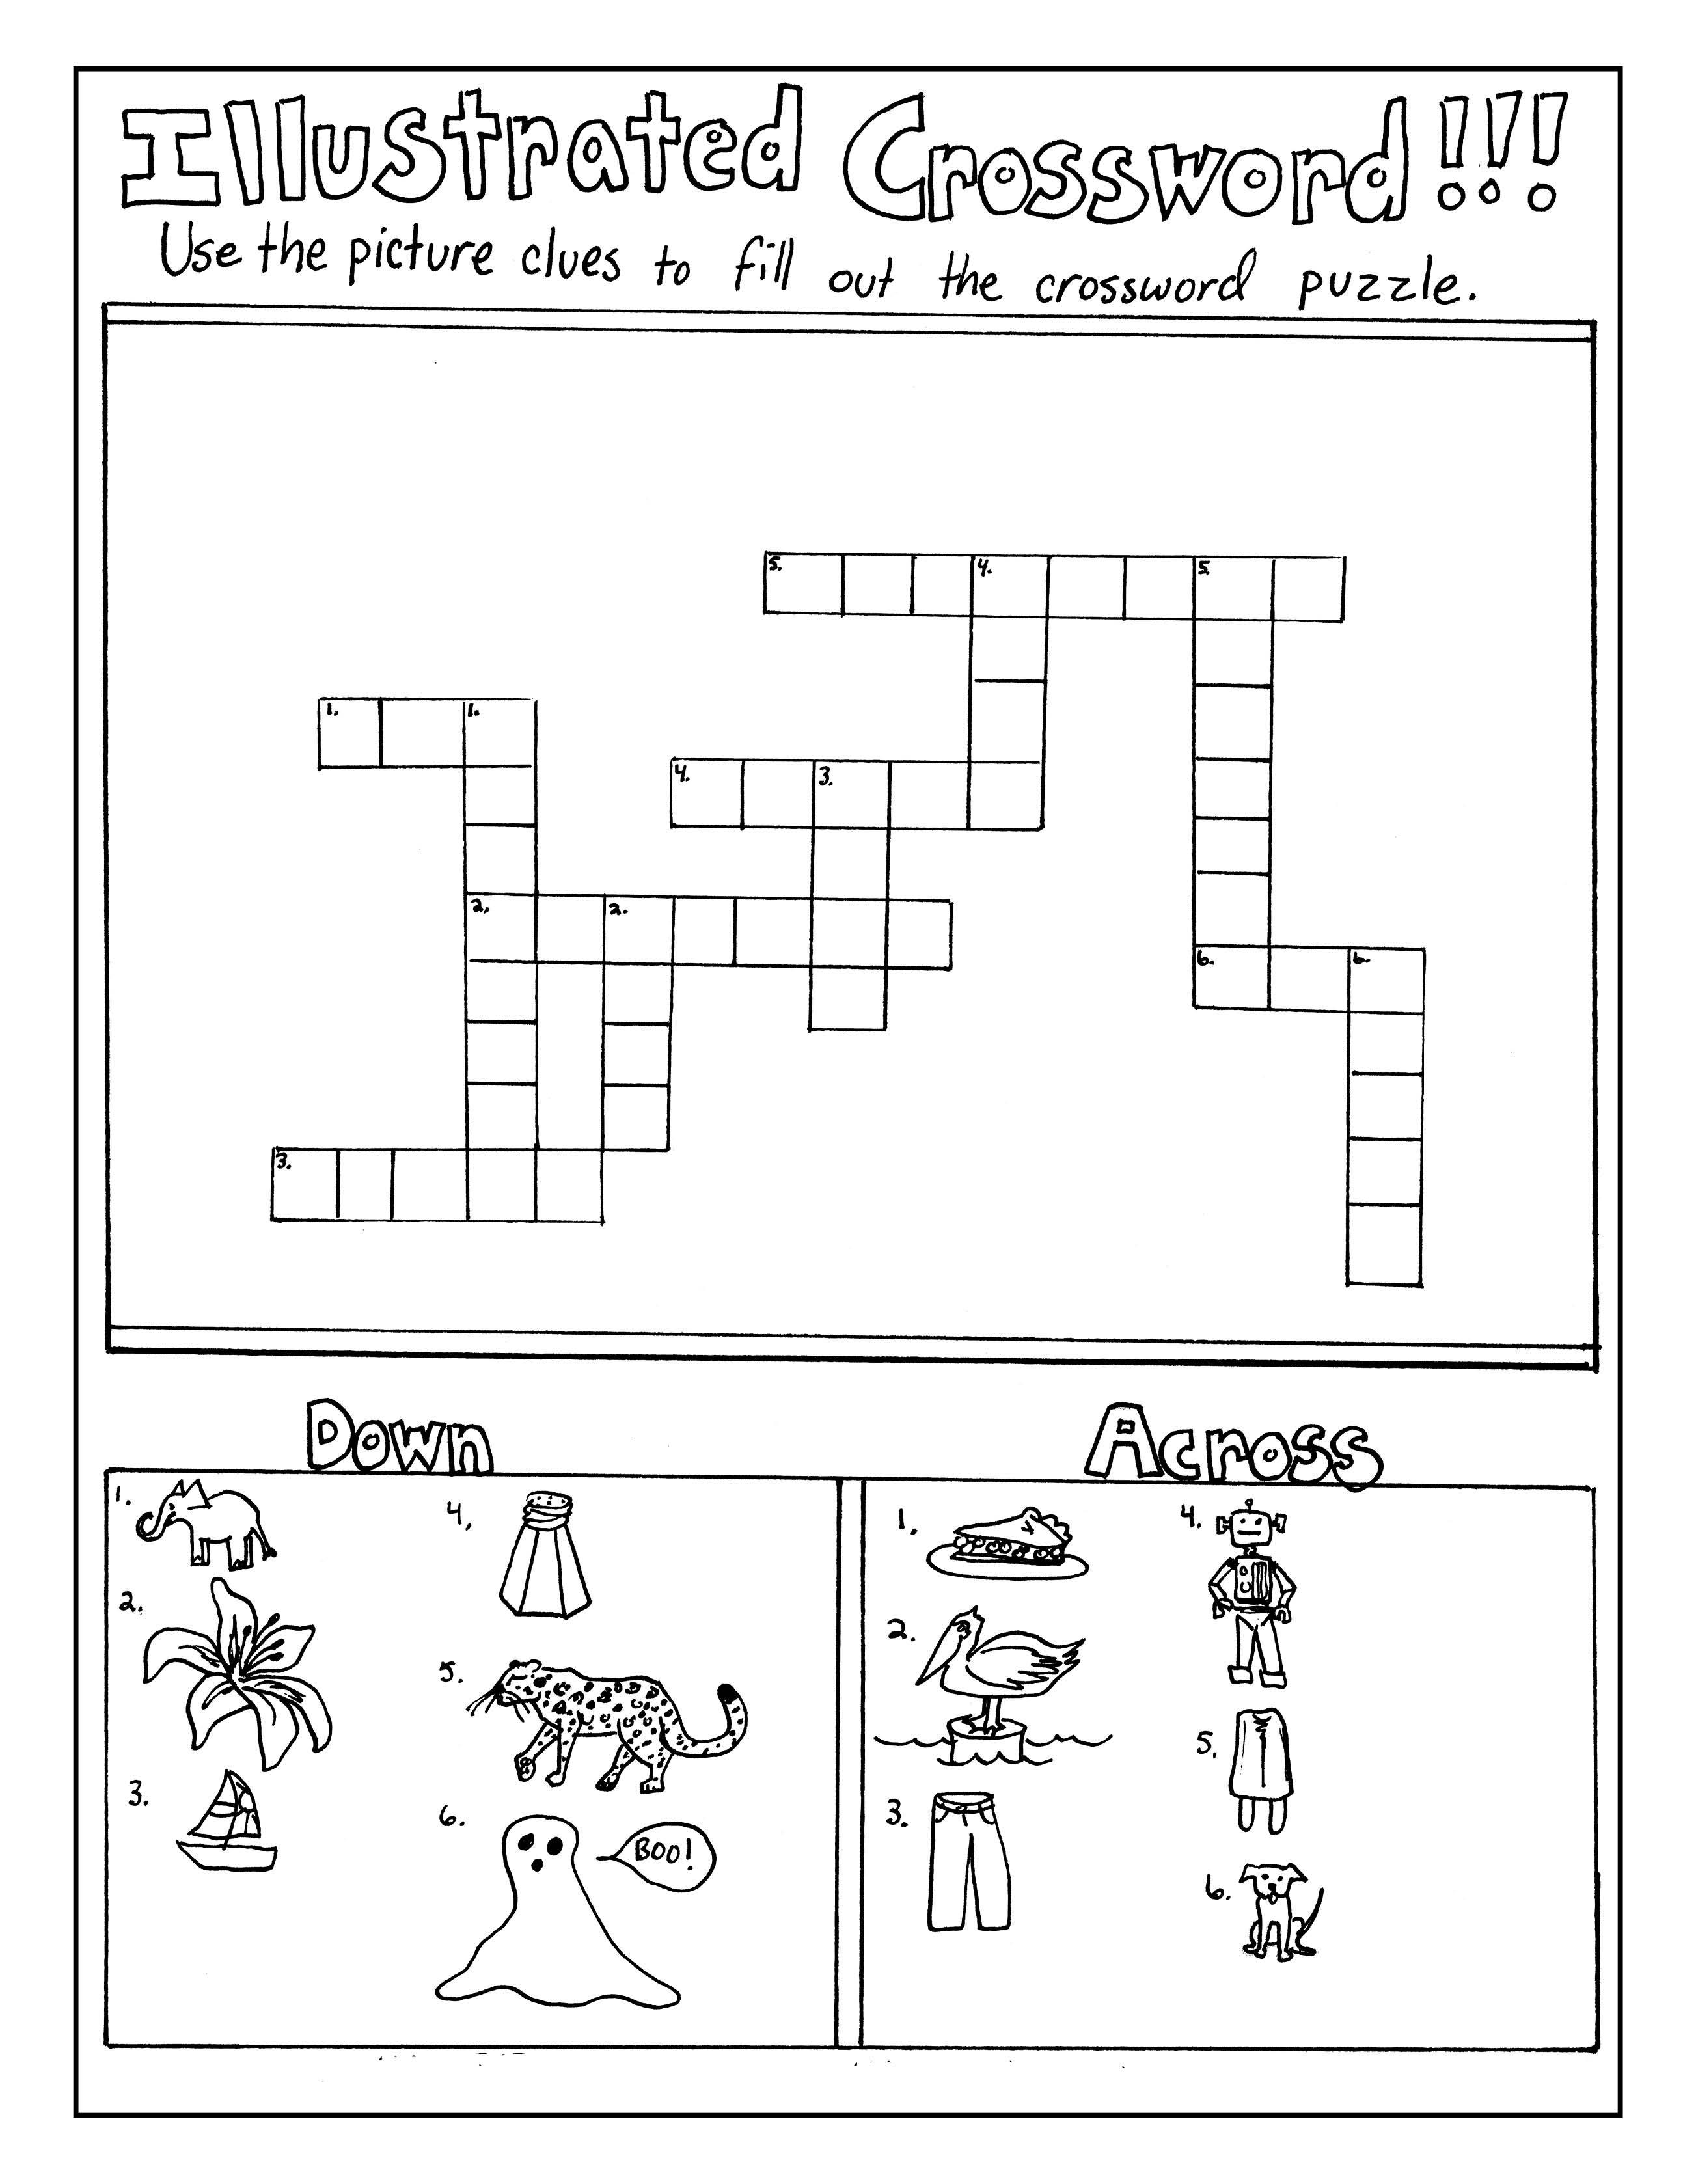 Illustrated Crossword (AB1)